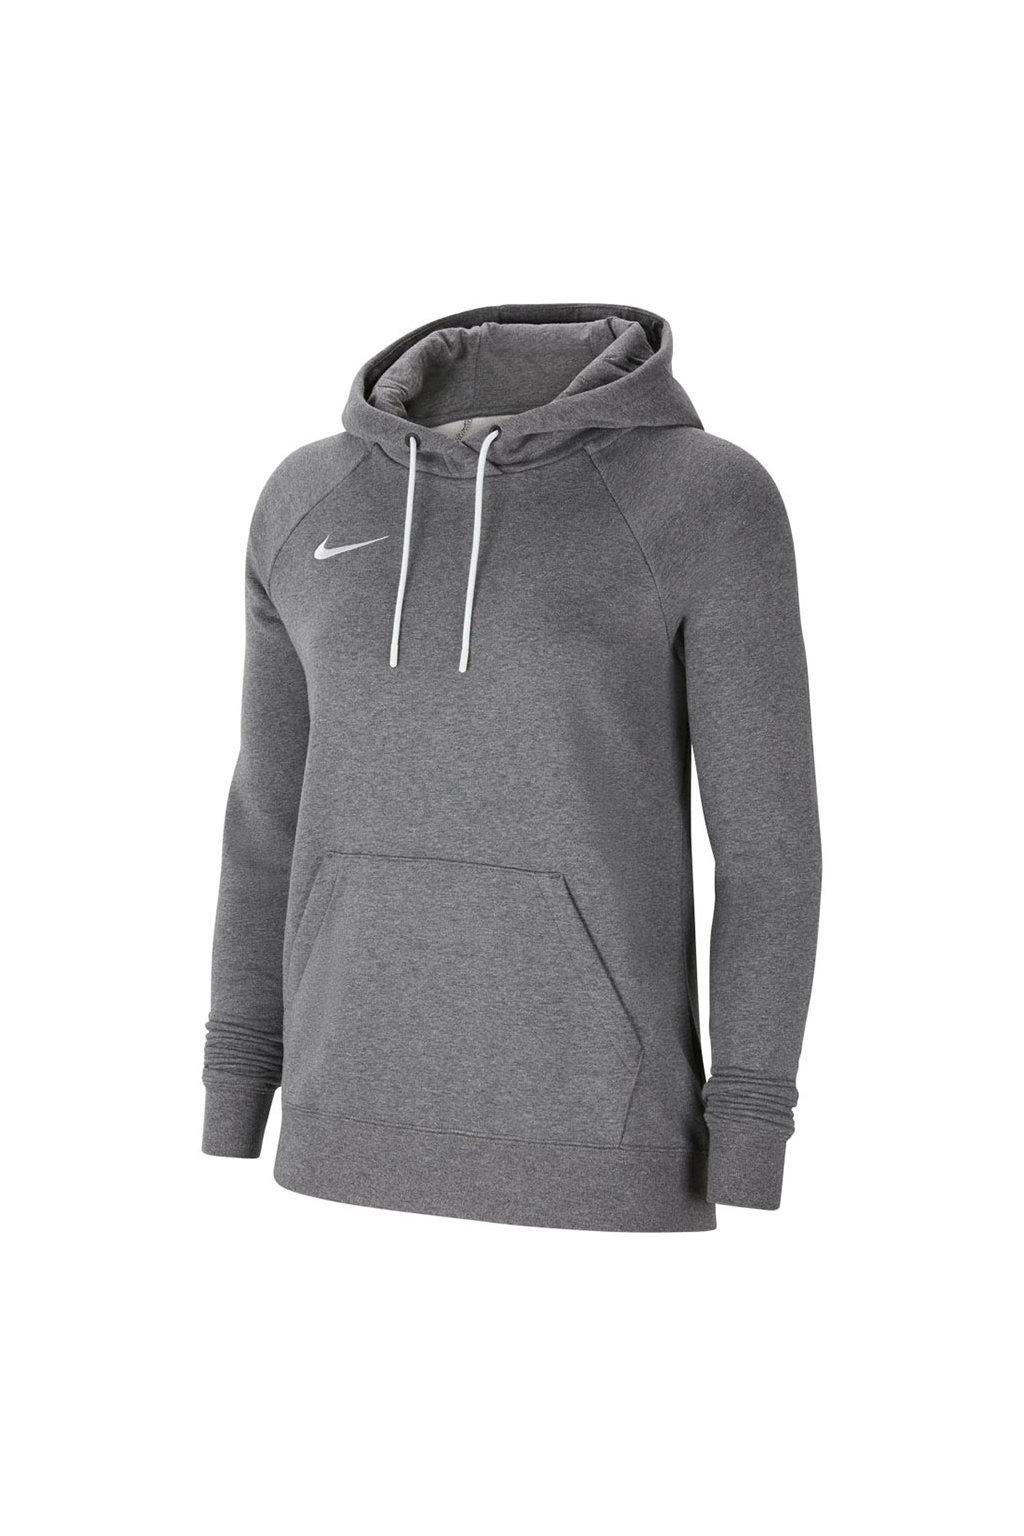 Dámska mikina Nike Team Club 20 Hoodie šedá CW6957 071